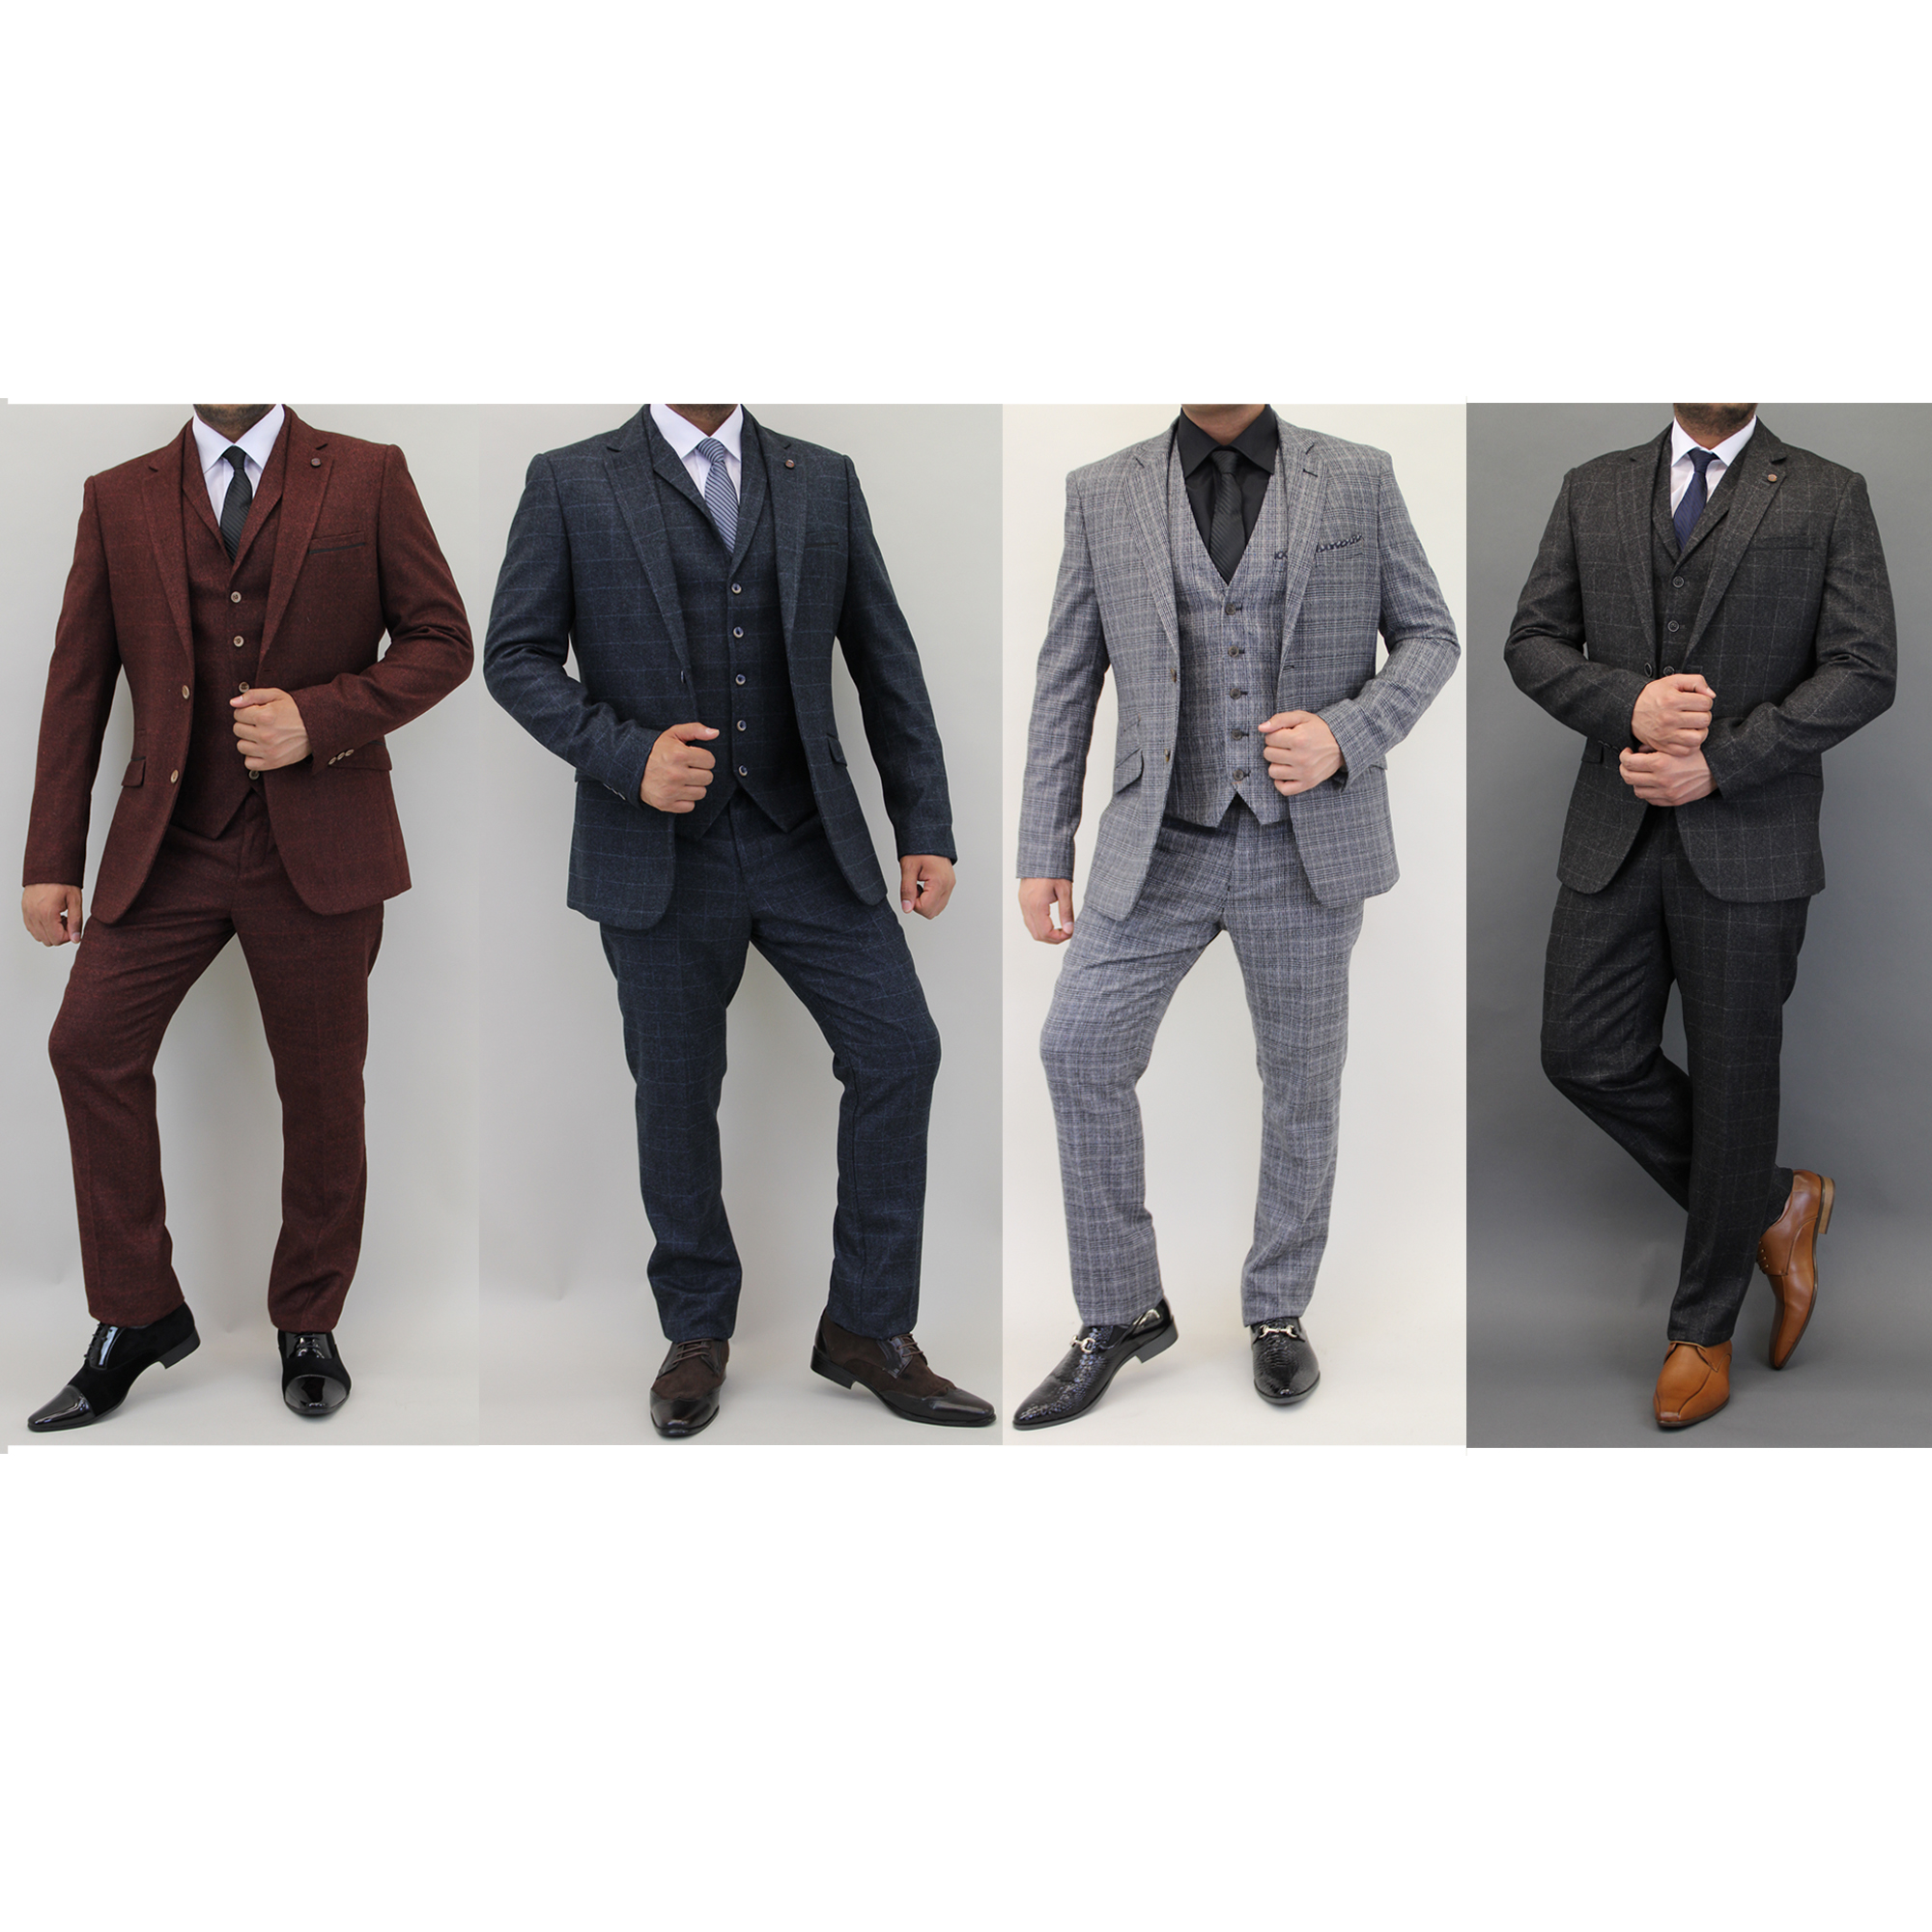 Mens Designer Cavani Tweed Blazer Waistcoat Trousers £120 For Full 3 Piece Suit